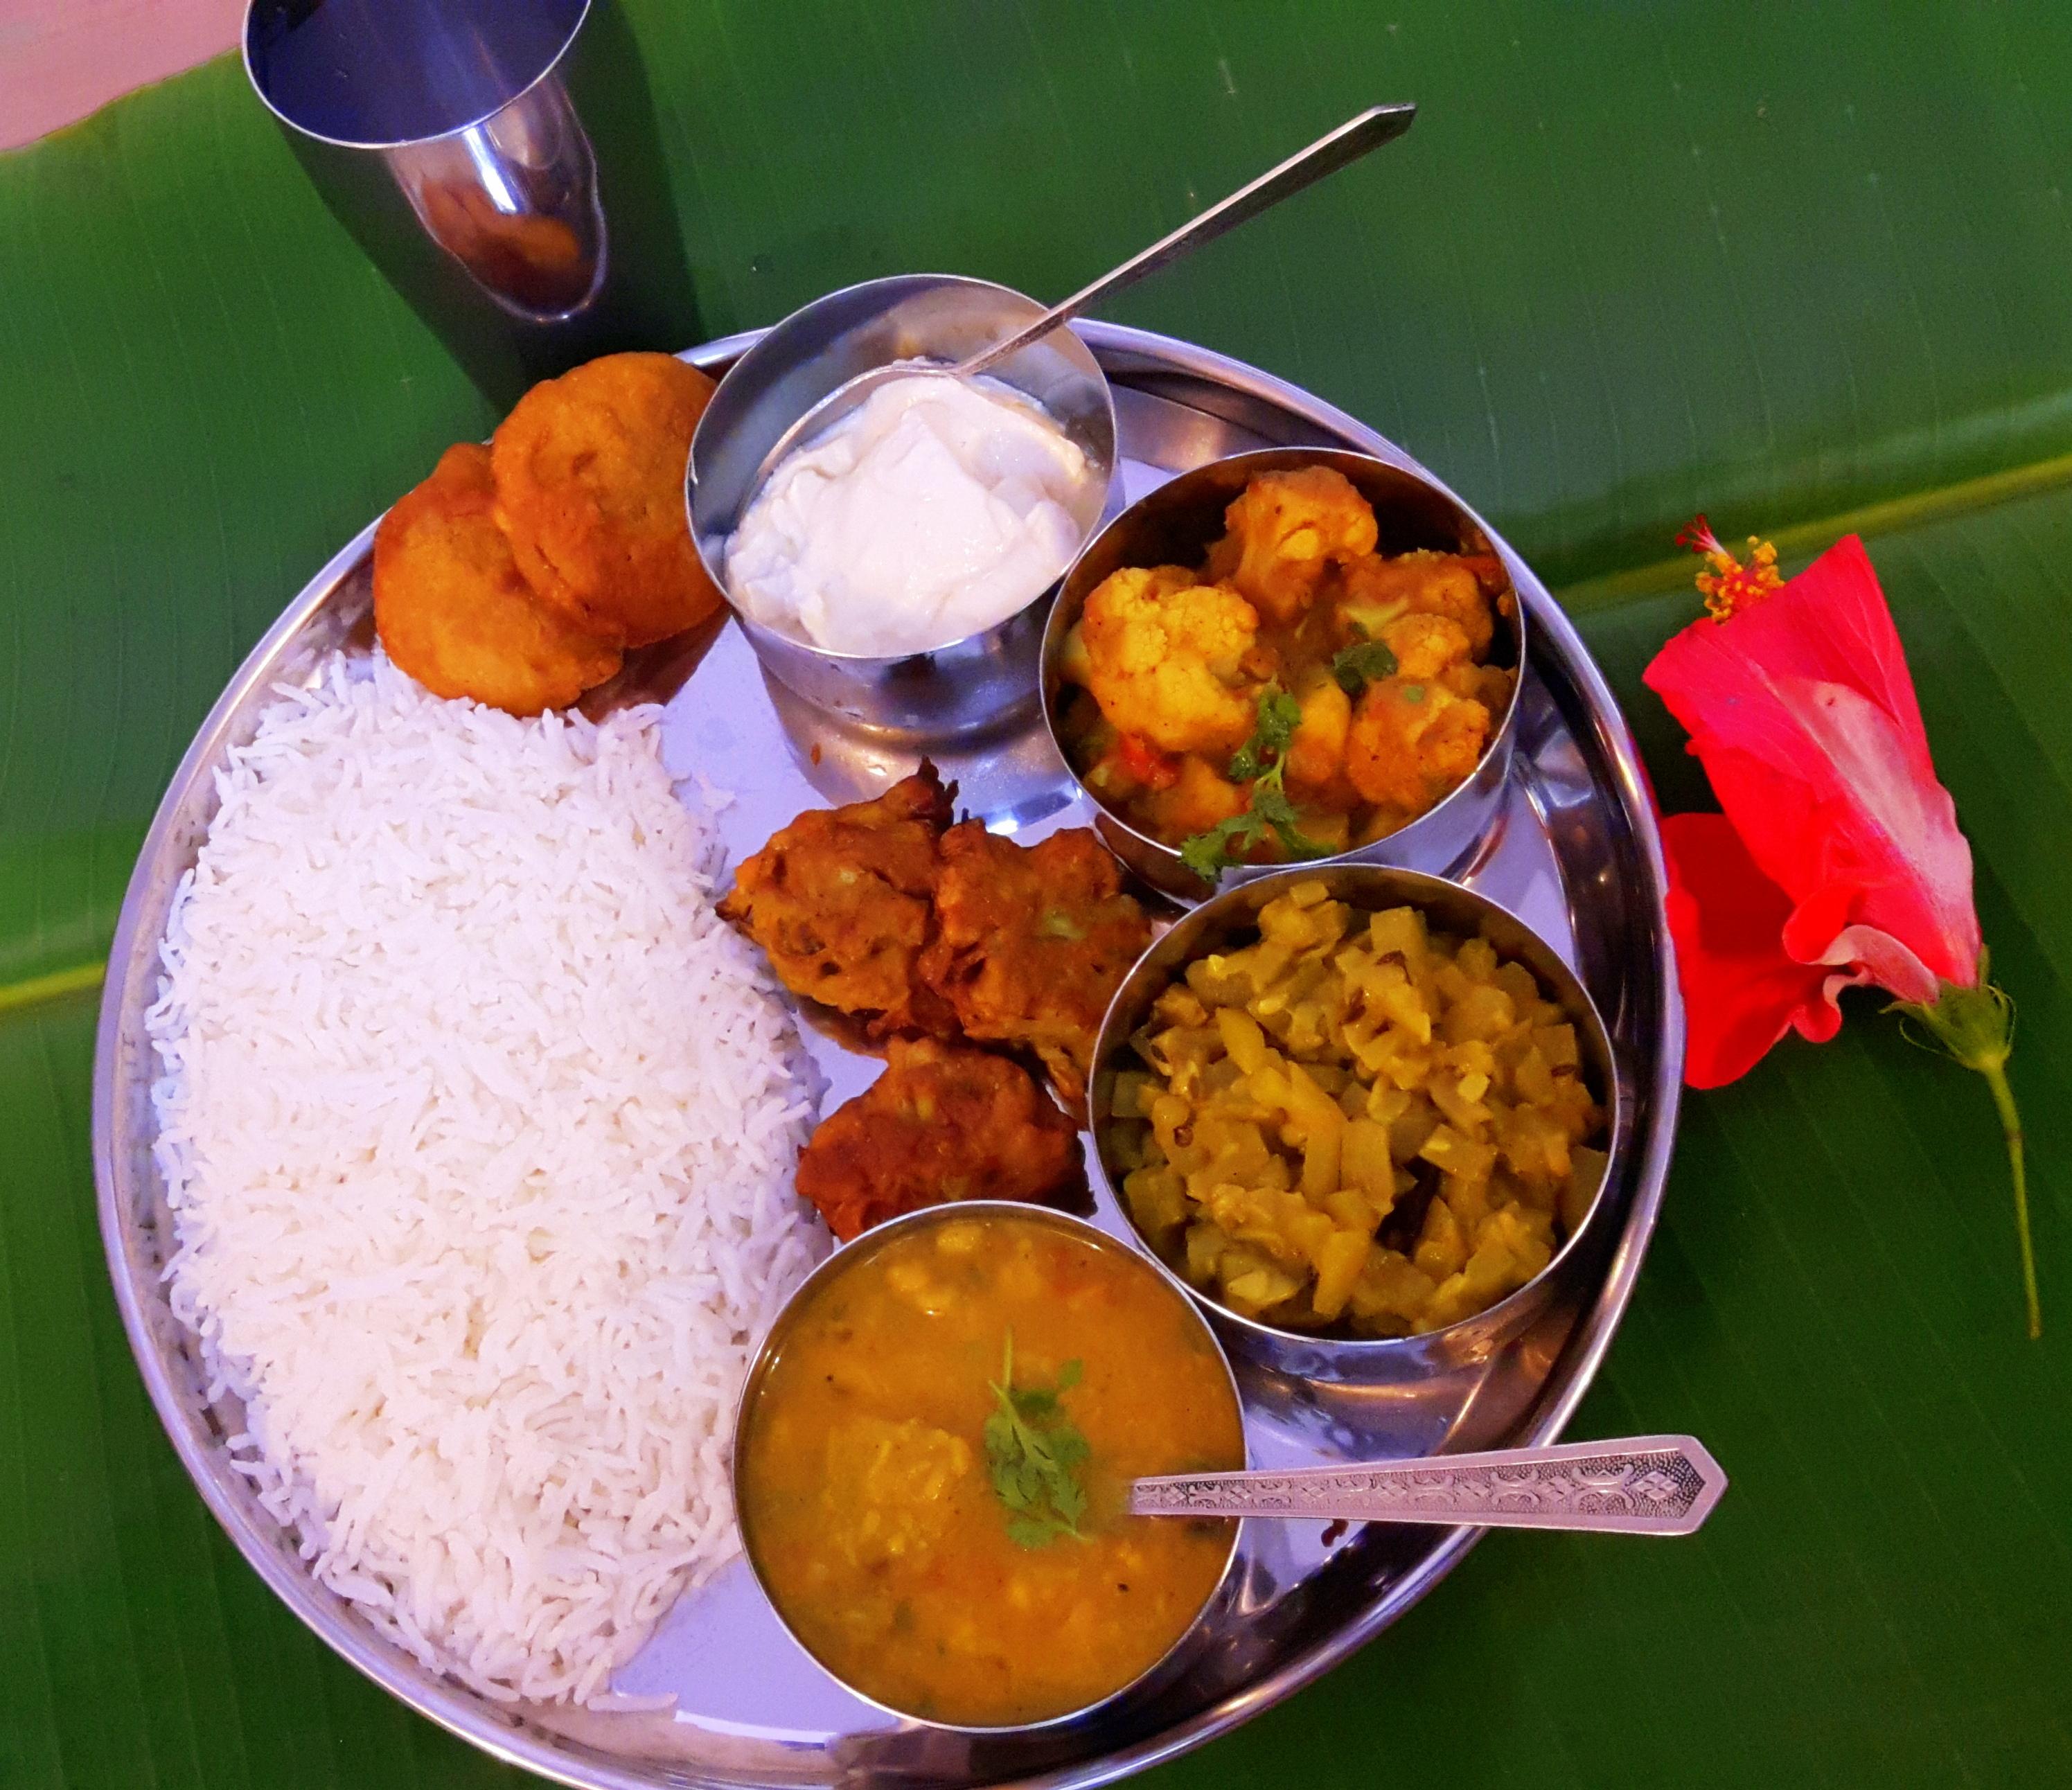 Chhath pooja nahay-khay Thali